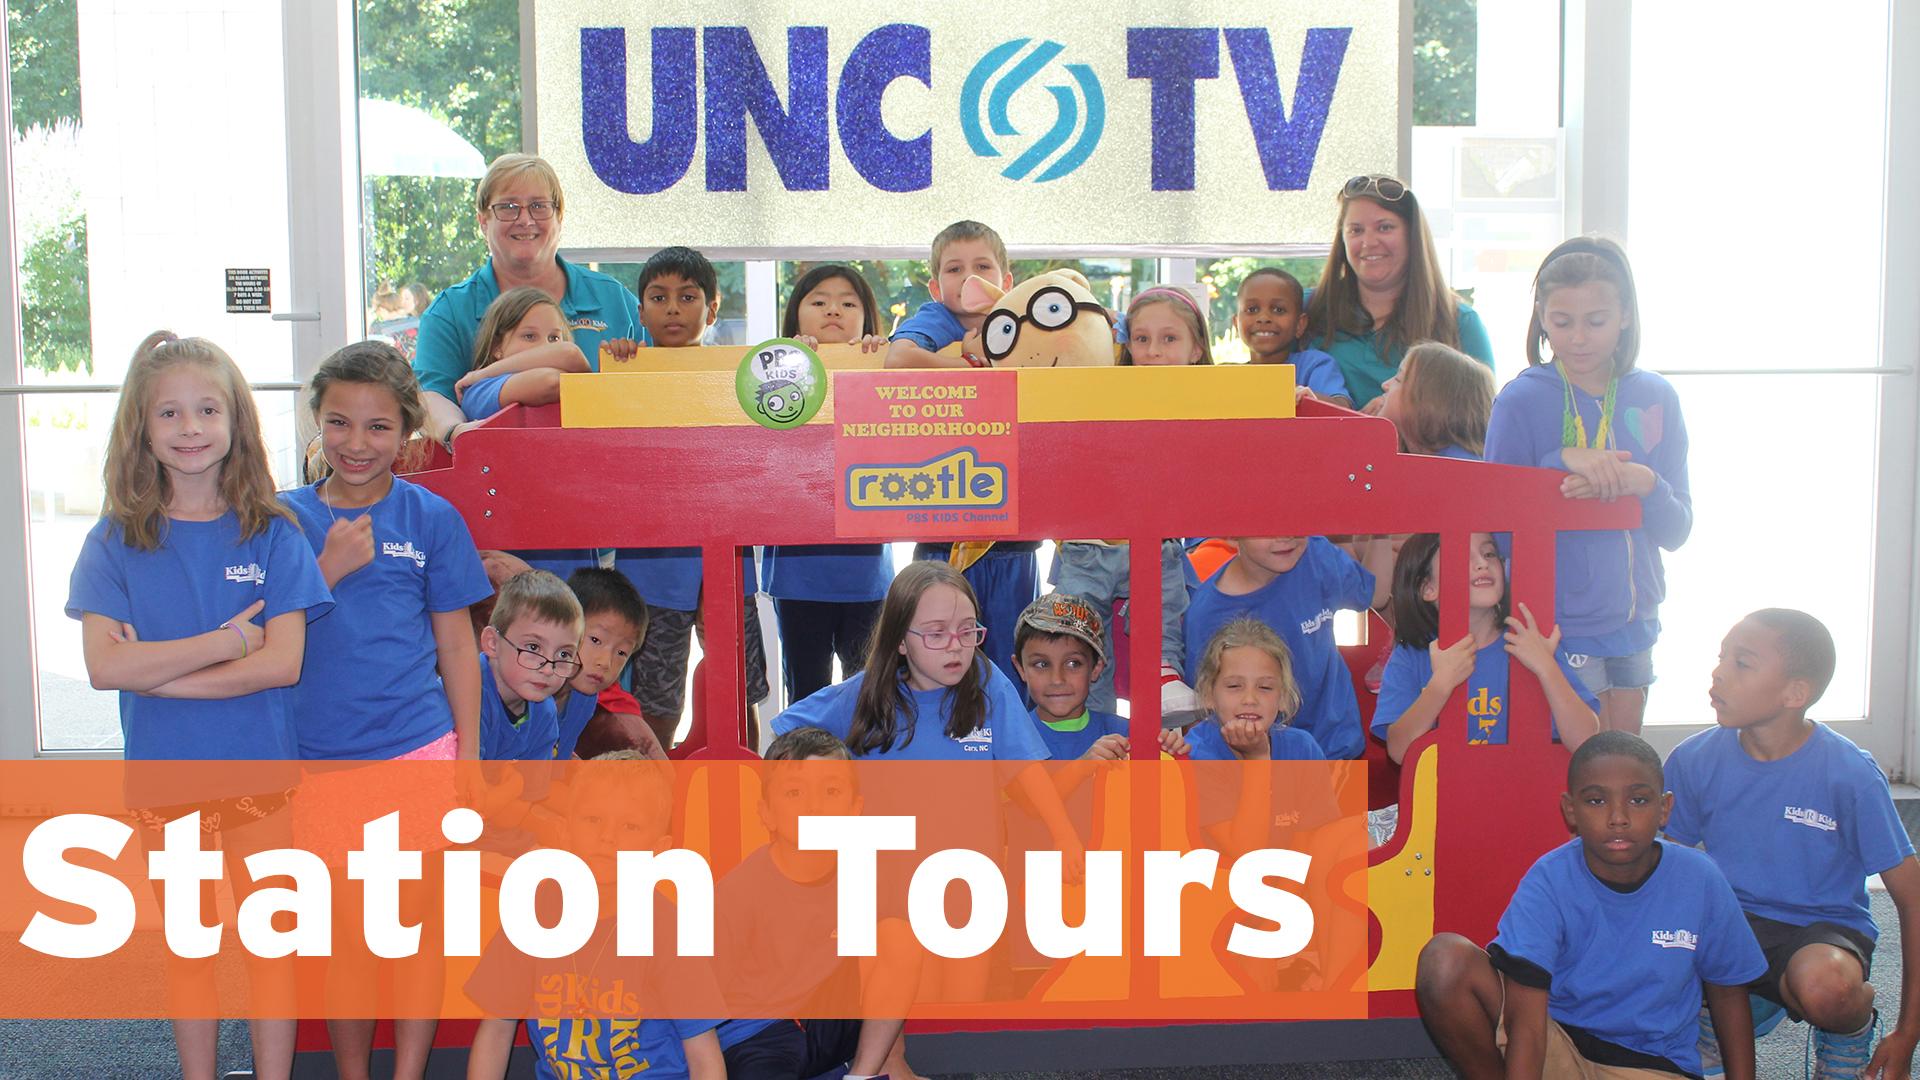 Station Tours